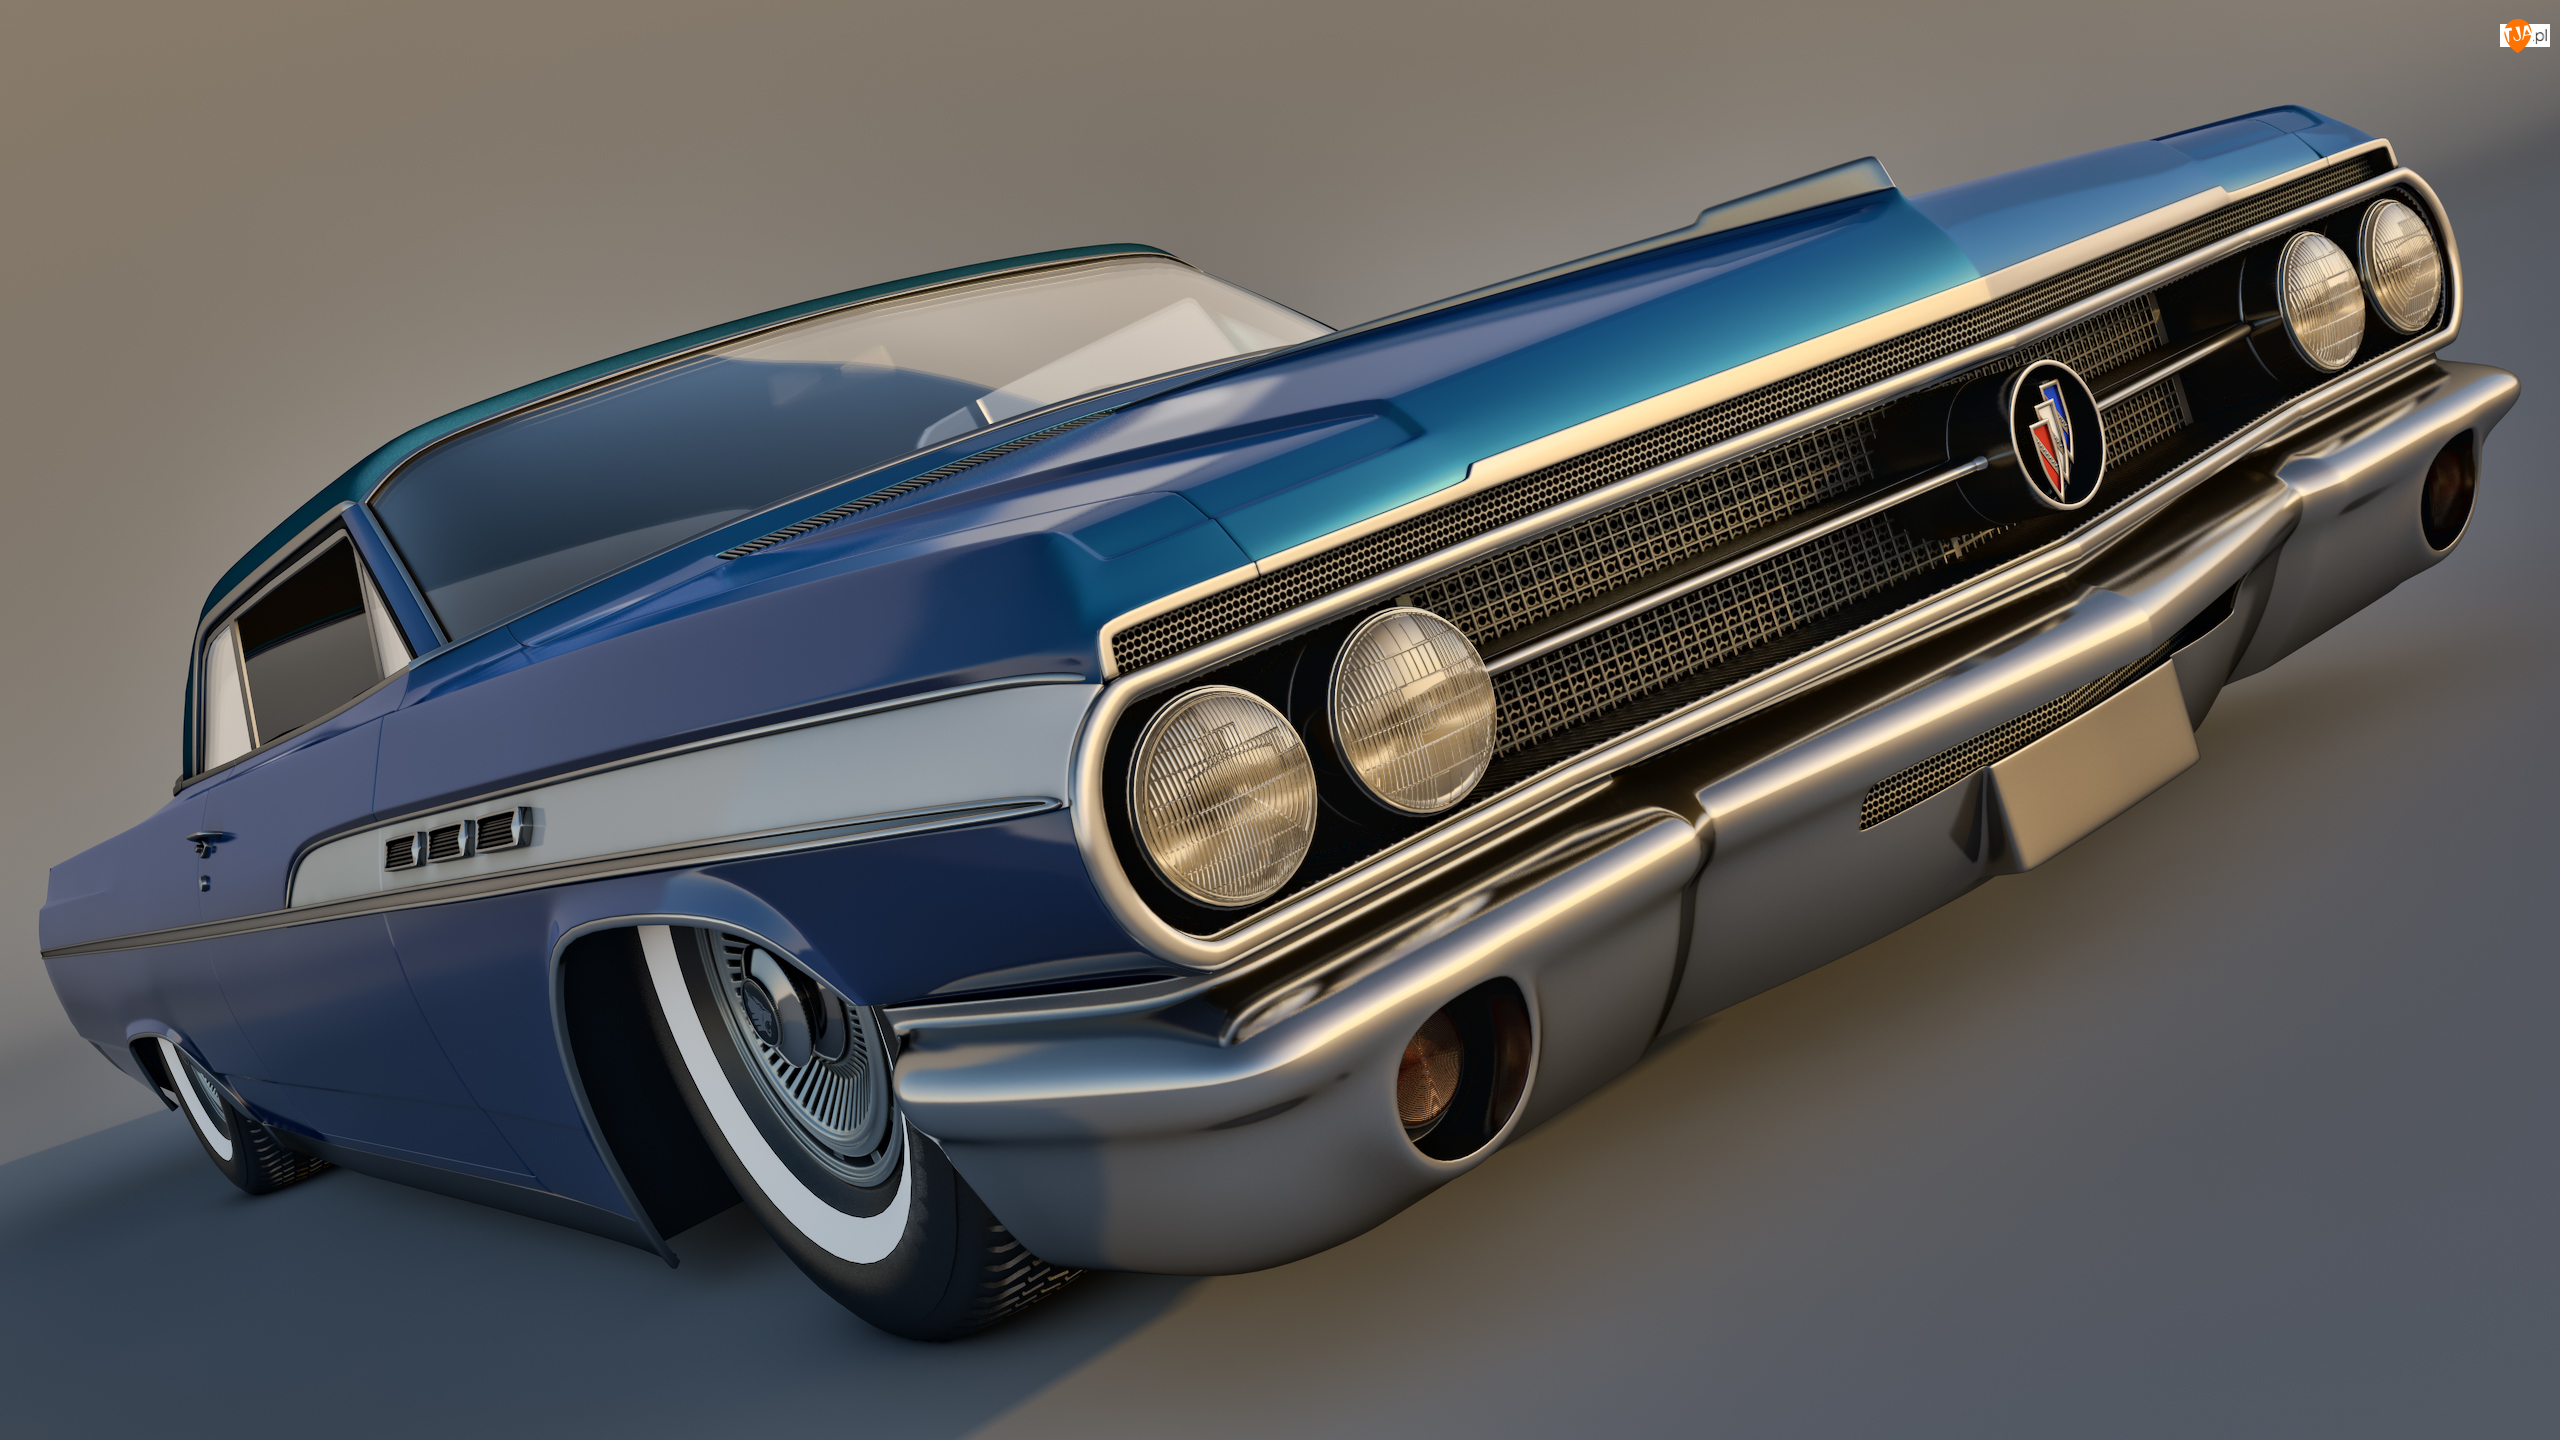 1963, Zabytkowy, Buick Wildcat MK1 Convertible